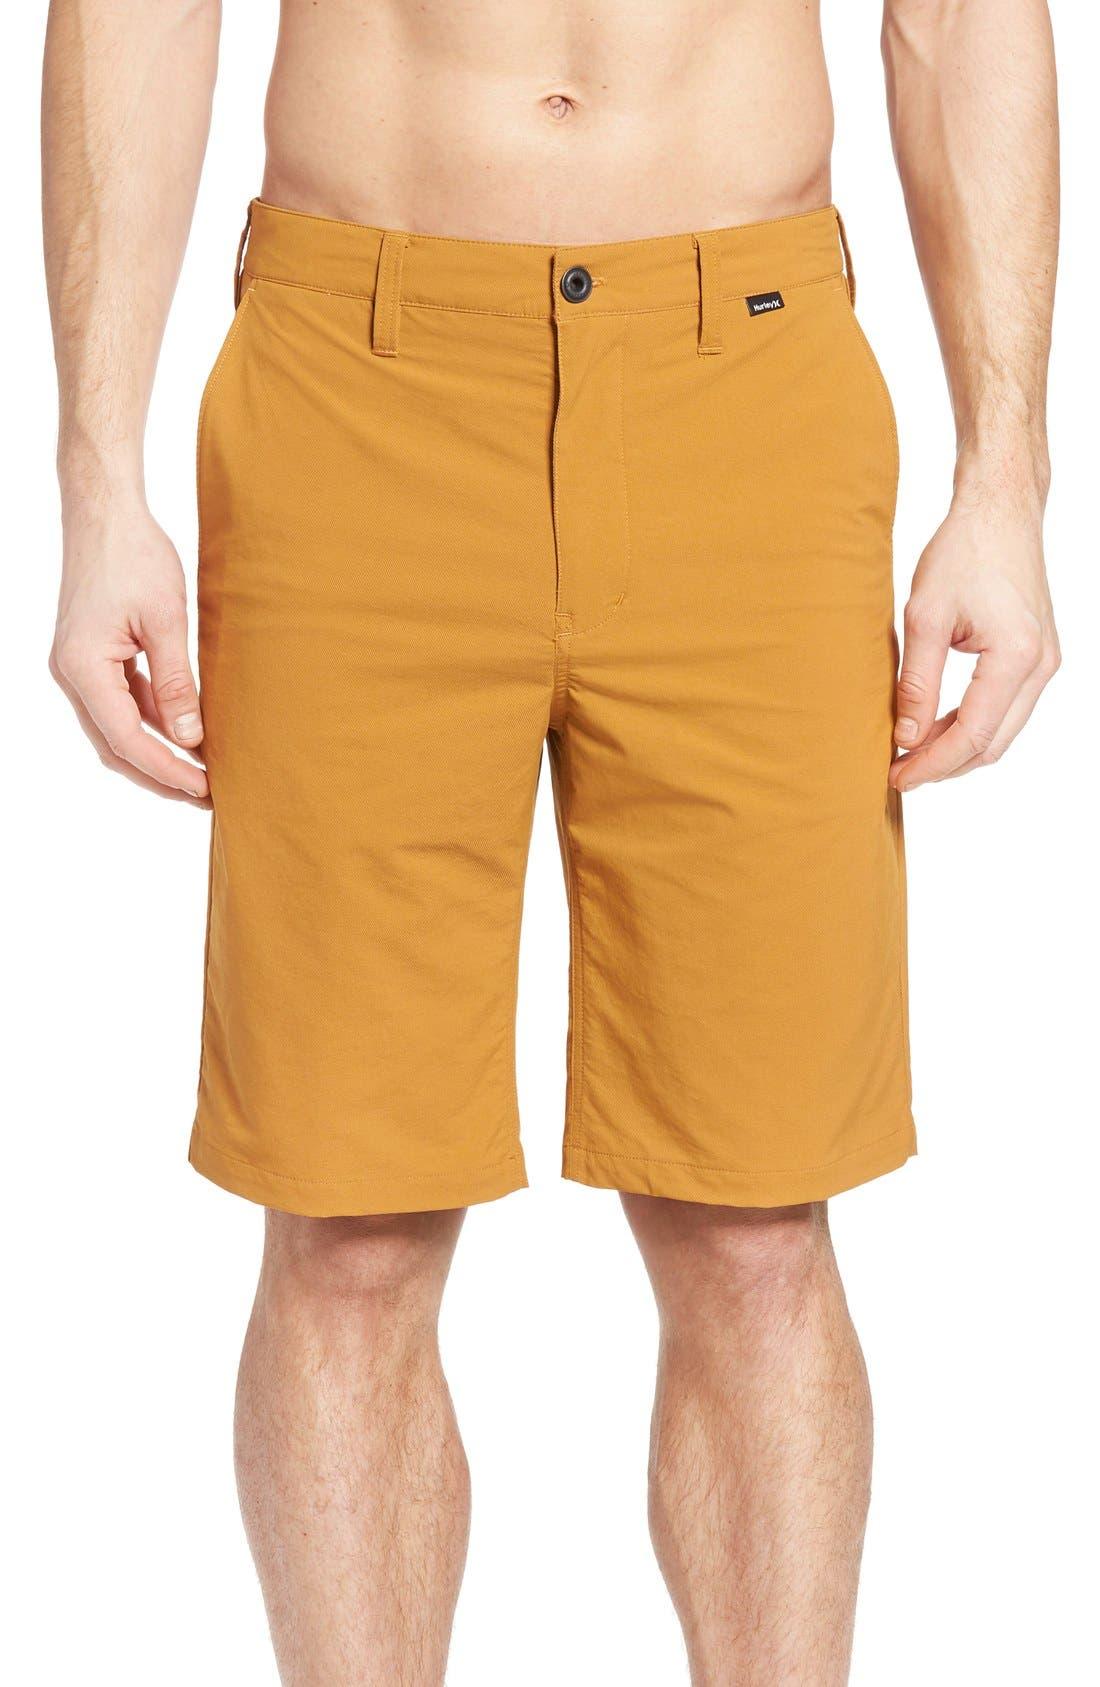 'Dry Out' Dri-FIT<sup>™</sup> Chino Shorts,                             Main thumbnail 1, color,                             010